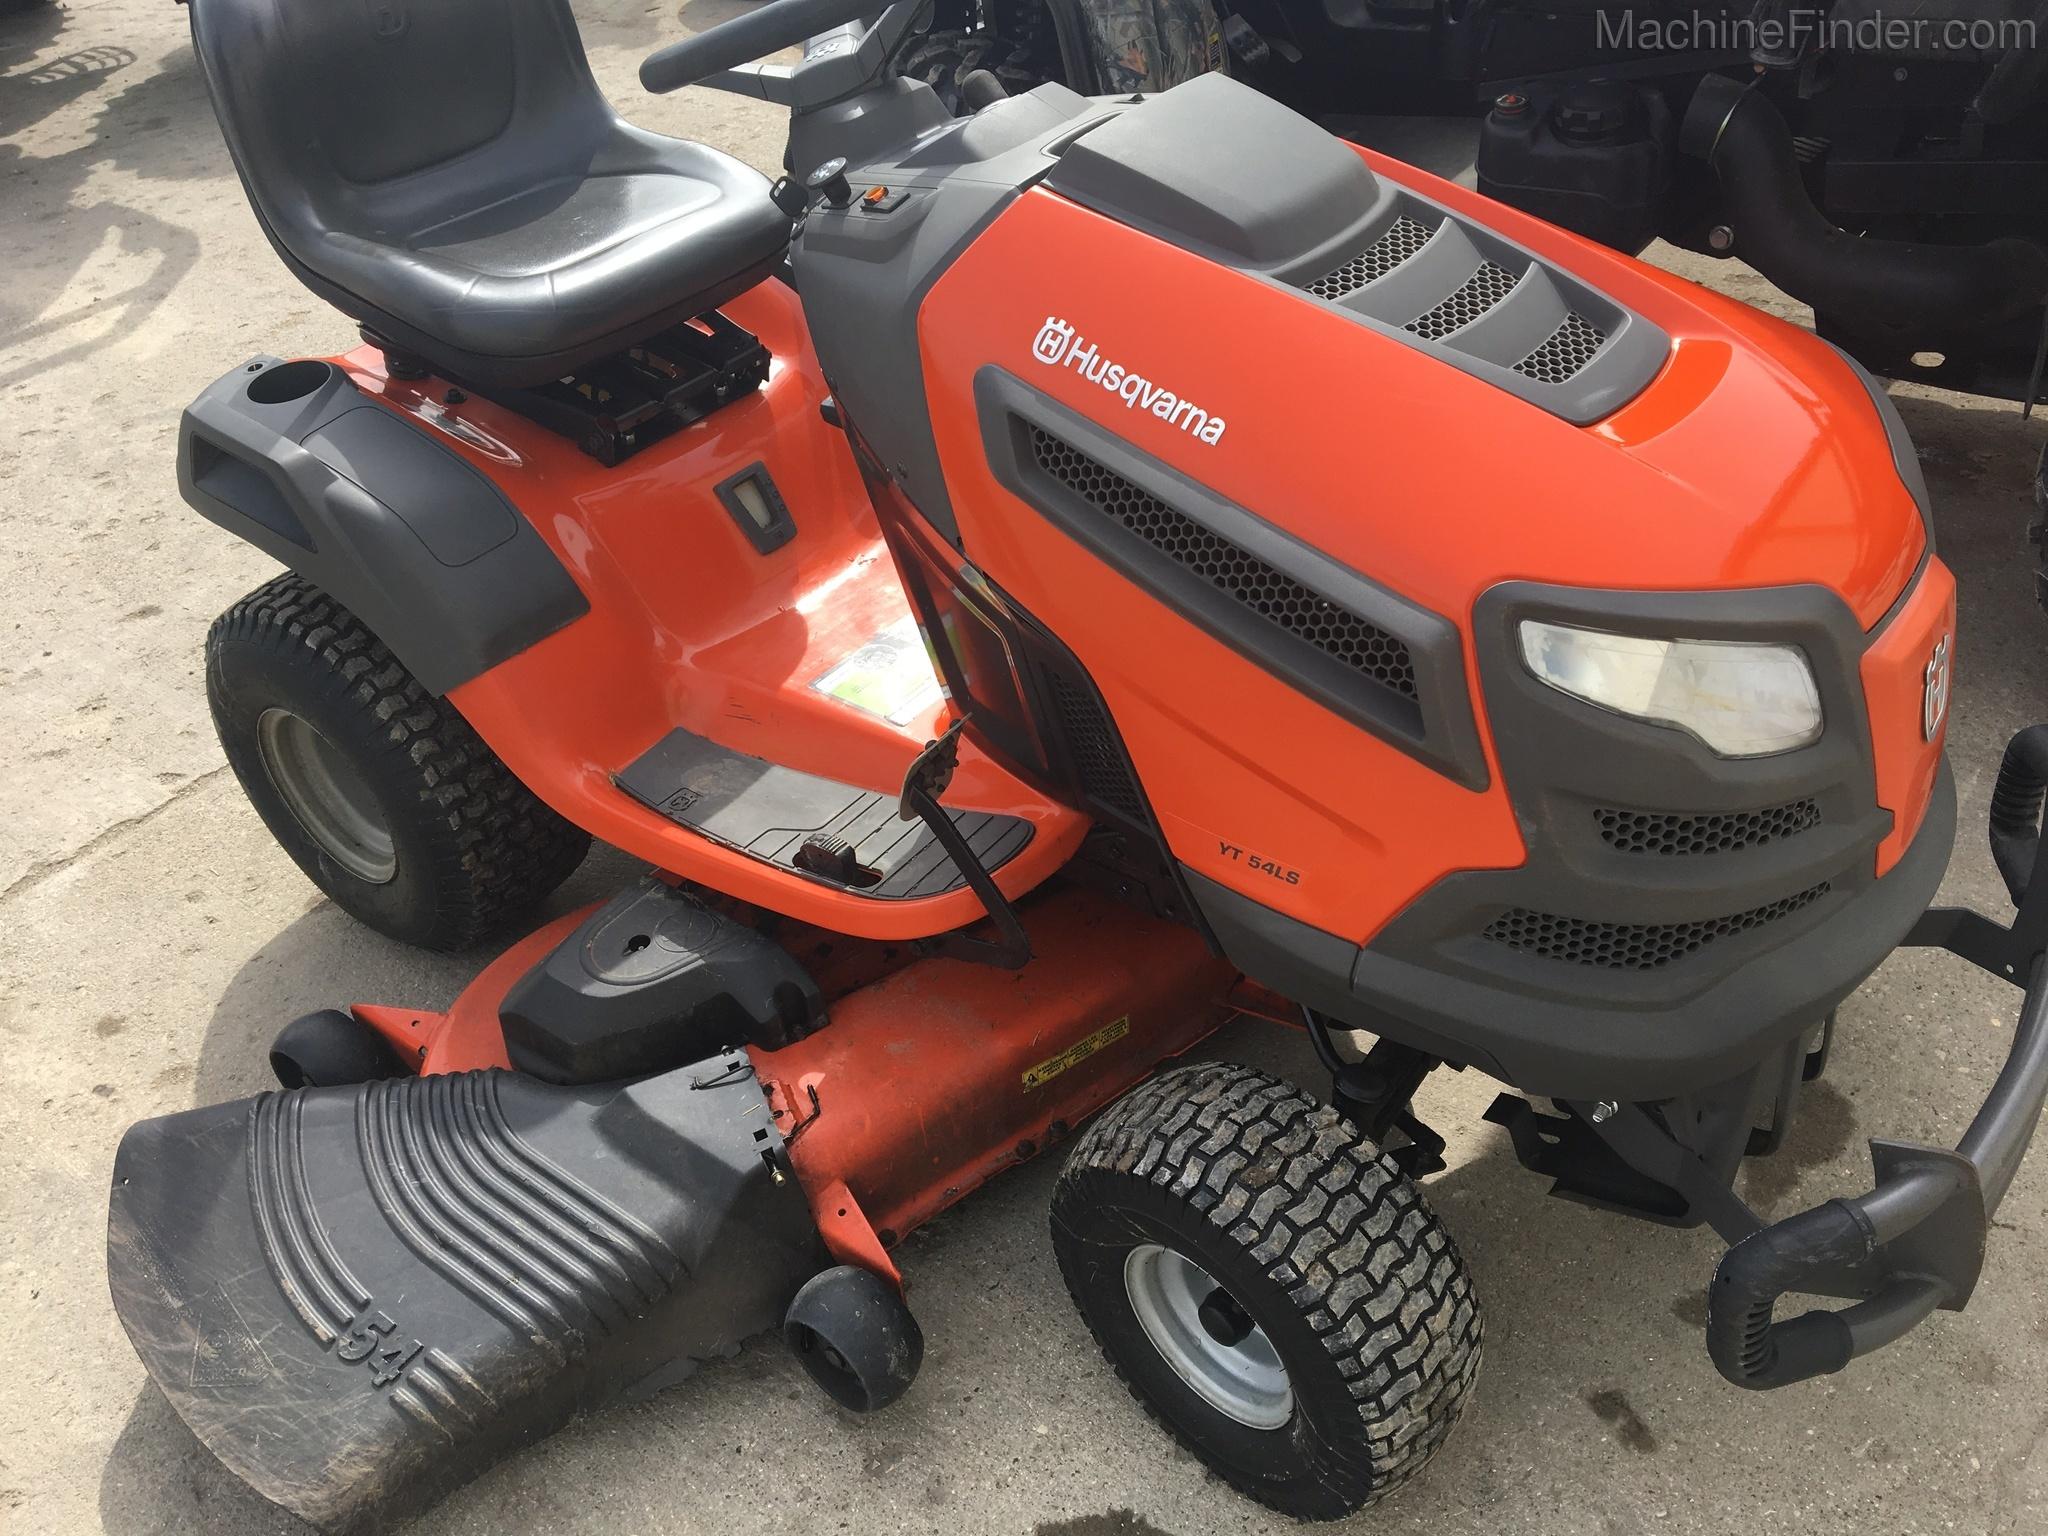 2013 husqvarna yt54ls lawn garden tractors john deere machinefinder - Husqvarna Garden Tractor